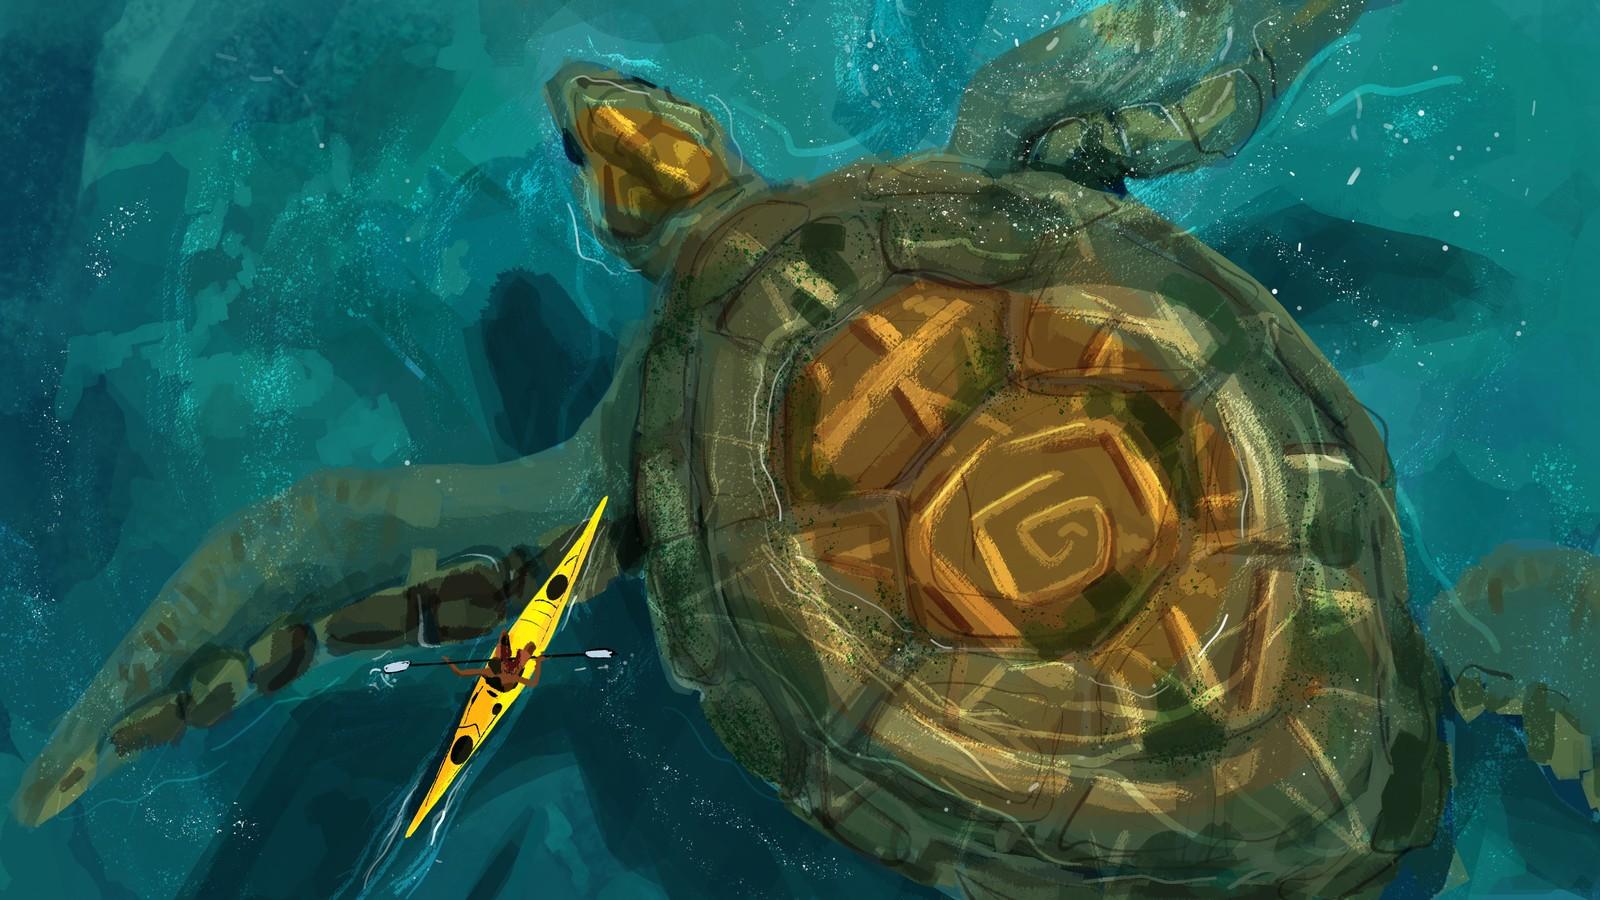 The Grand Turtle